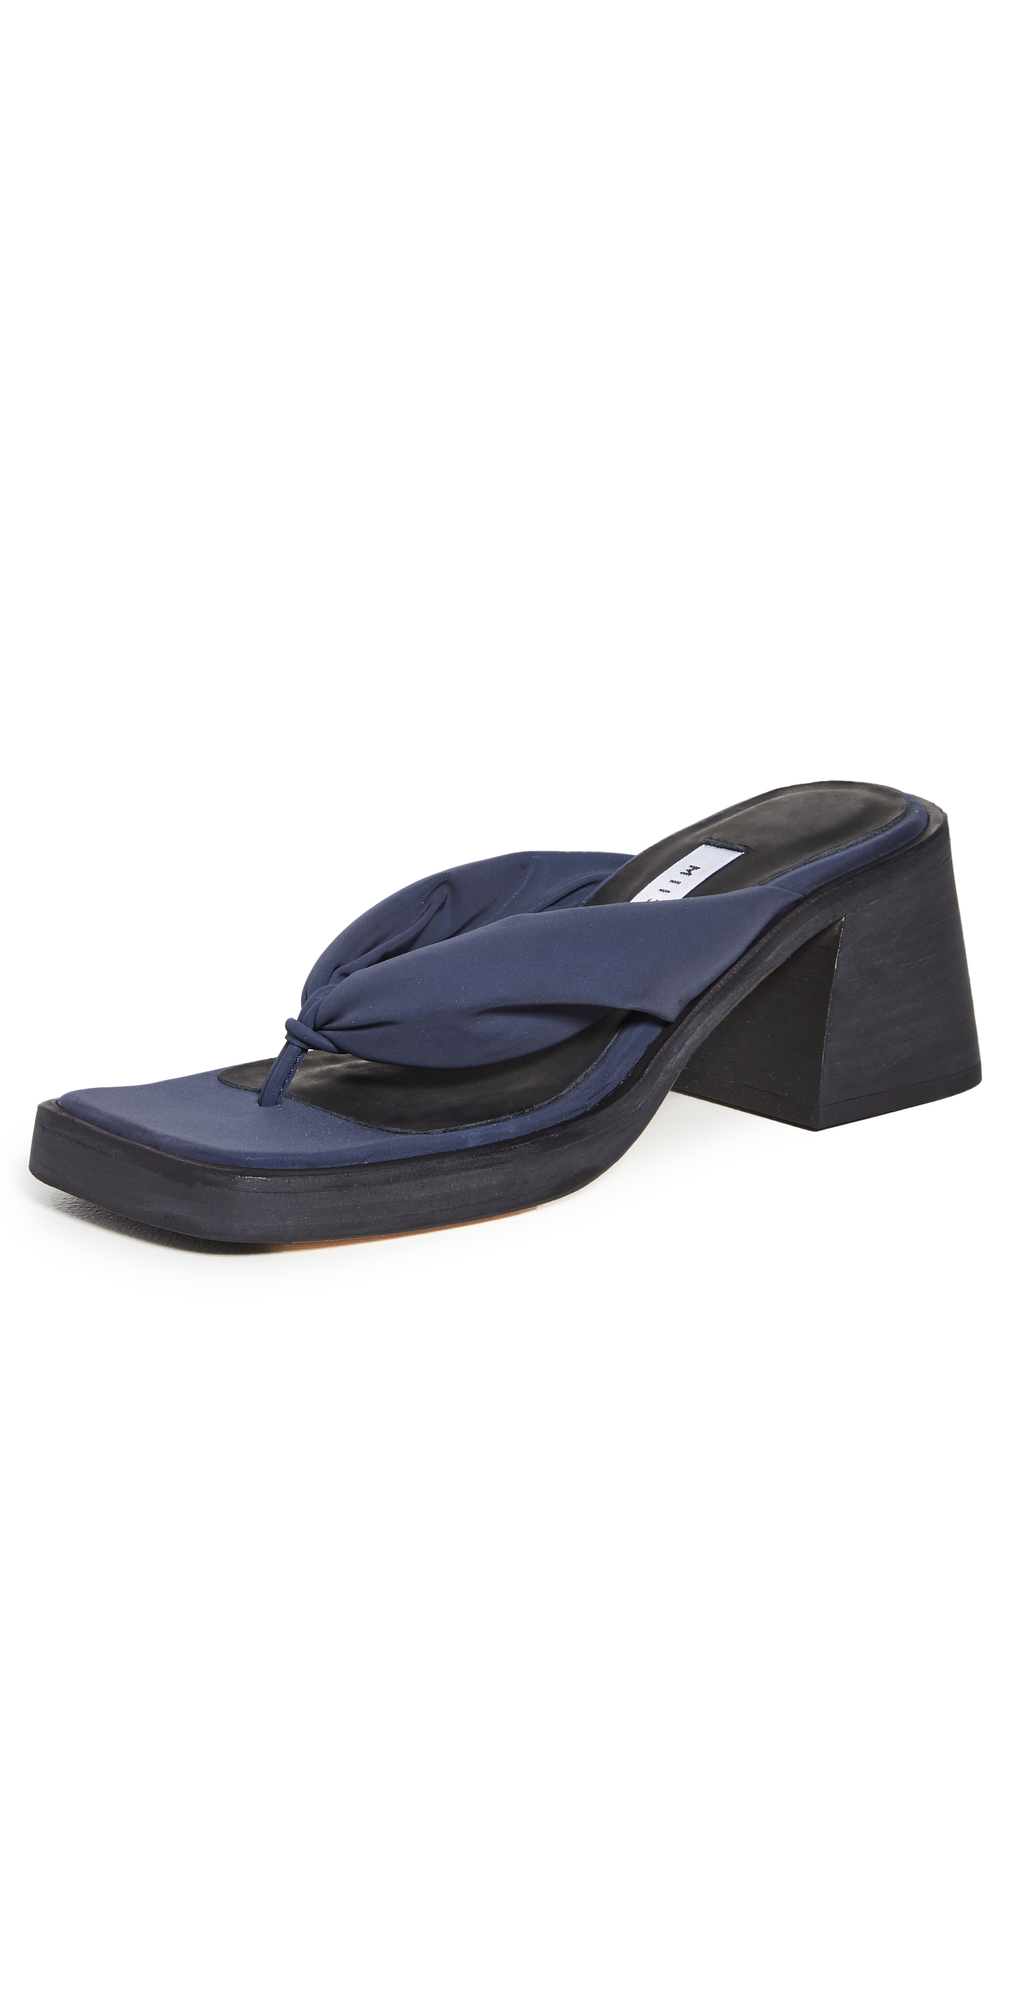 April Heeled Thong Sandals